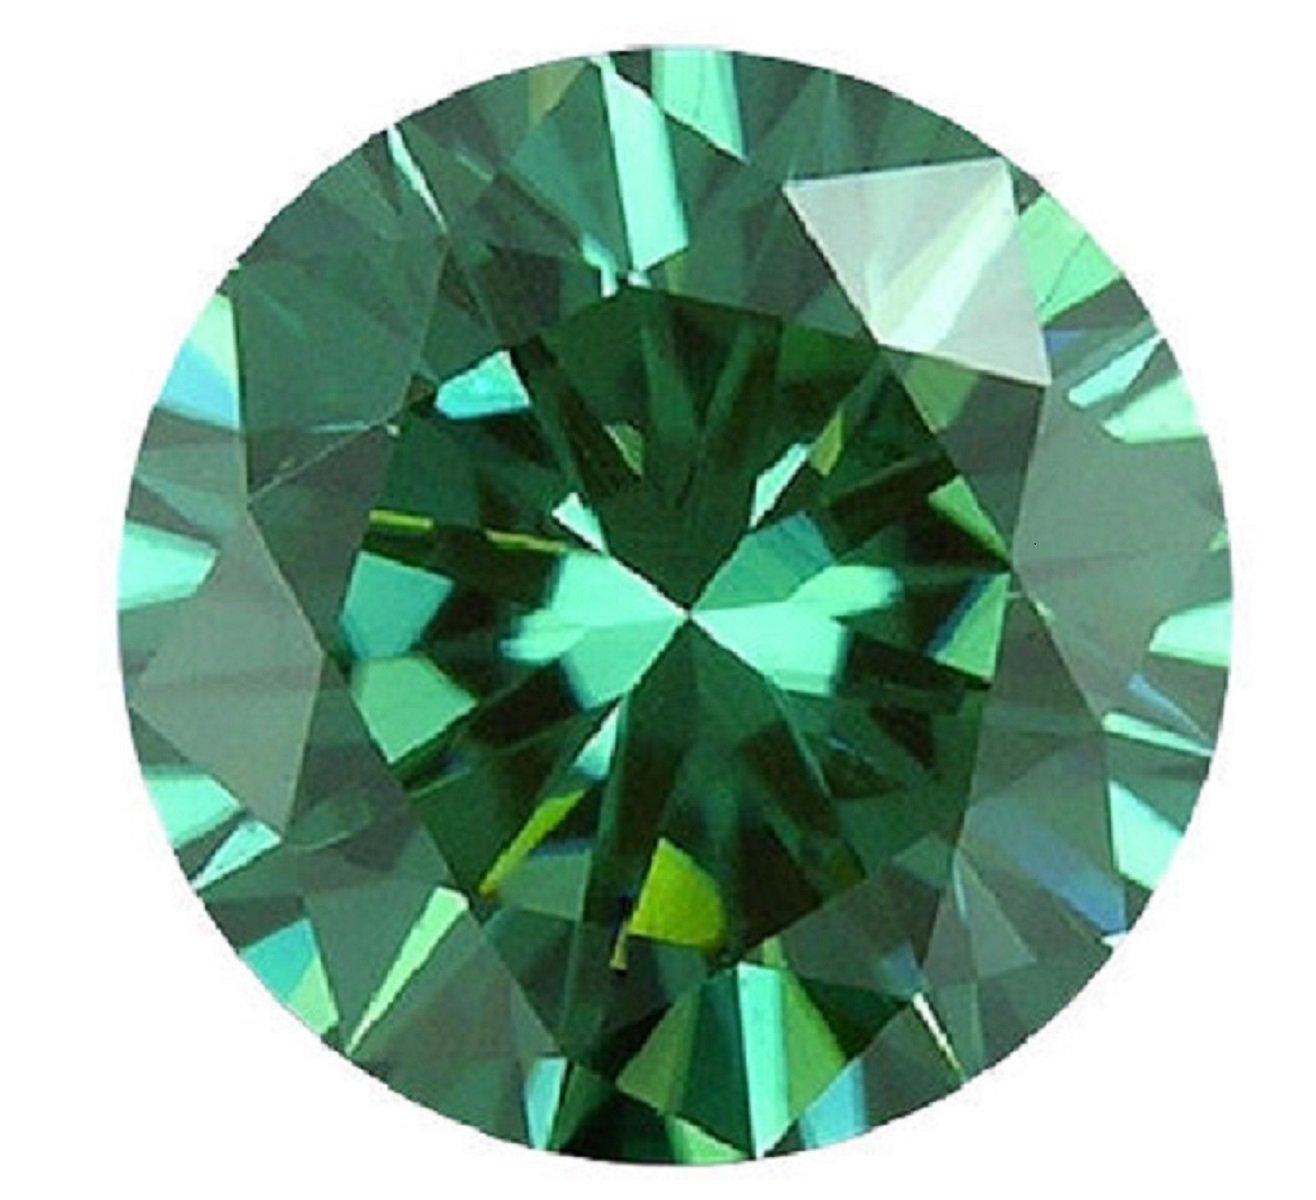 Arya's creation Moissanite Diamond, Loose Round Genuine Tested Moissanite, brilliant cut, green -blue color 0.5carat to 10carat (1.75)